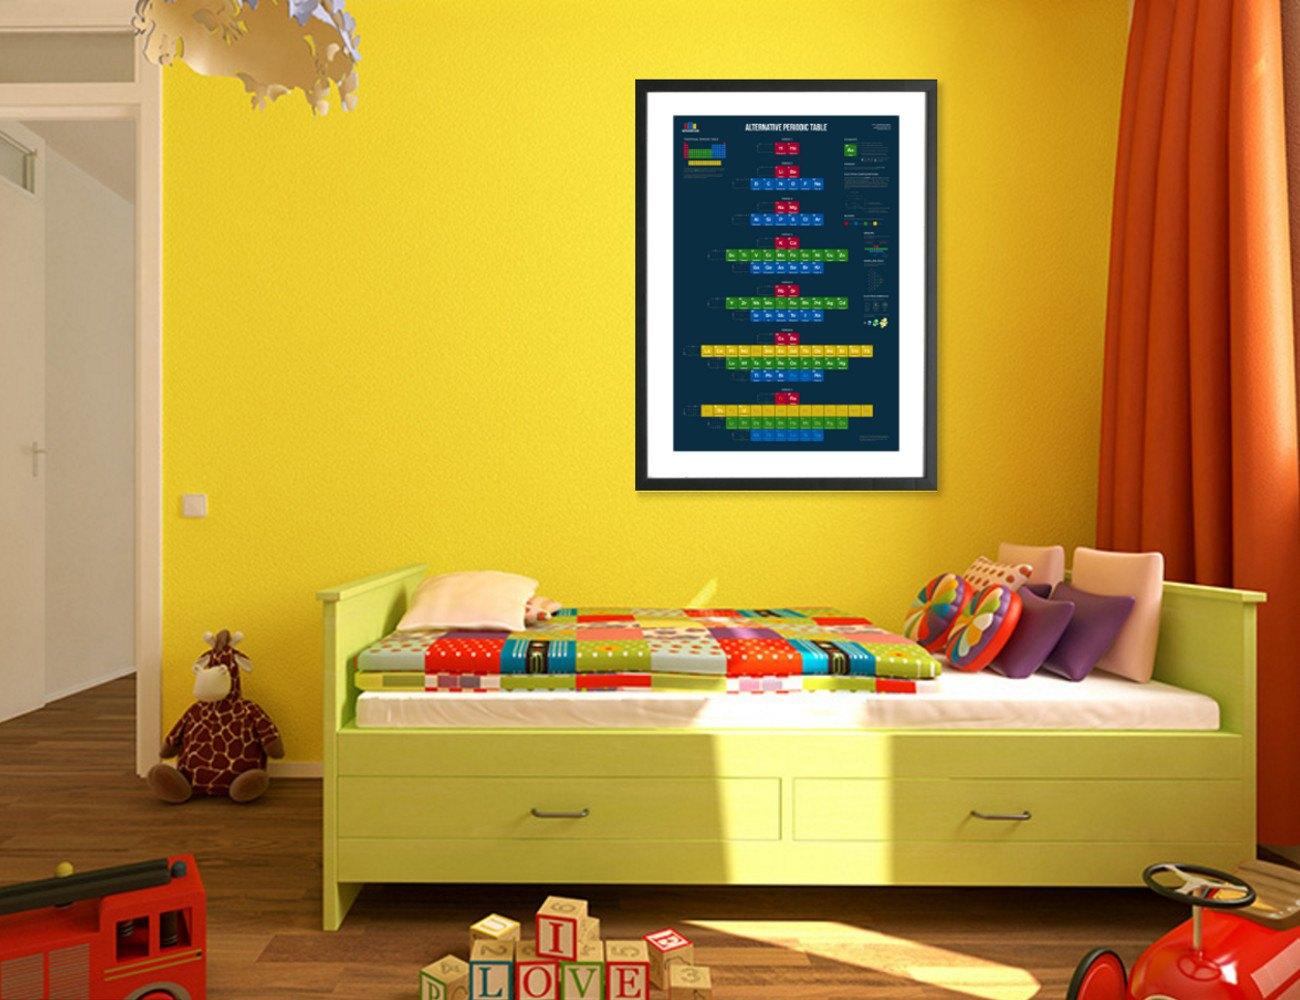 Alternative Periodic Table Poster